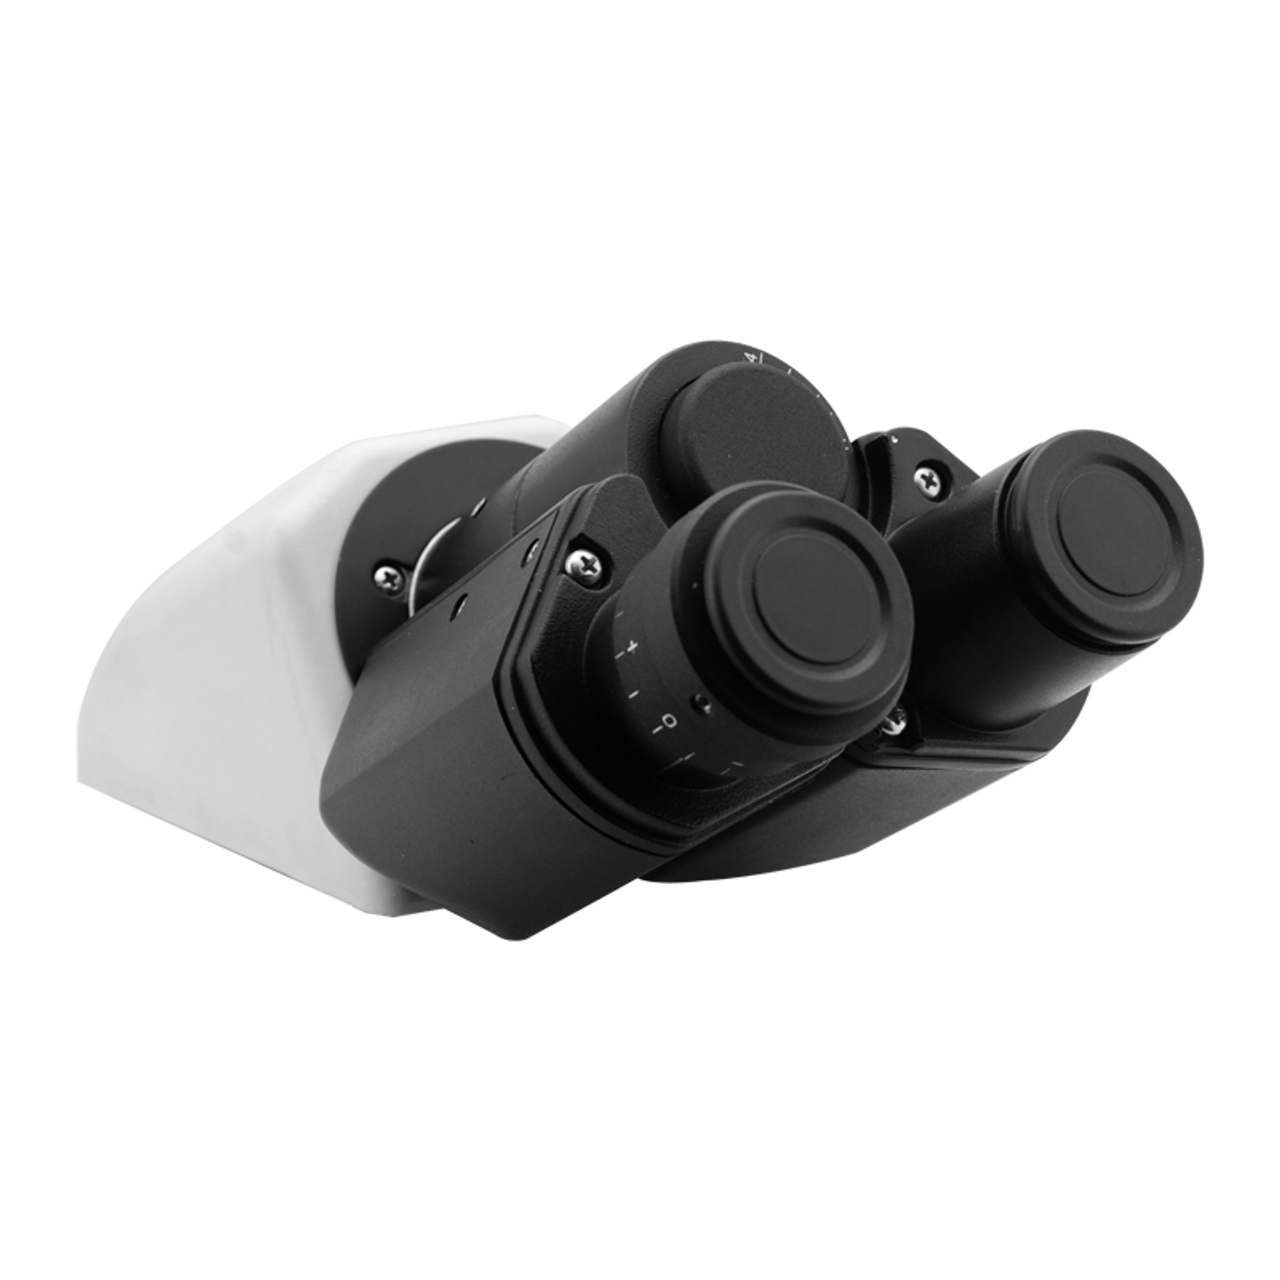 Infinite BoliOptics Binocular Compound Microscope Eyepiece Body Tube BM05101221 Eyetube Angle 30 Degrees